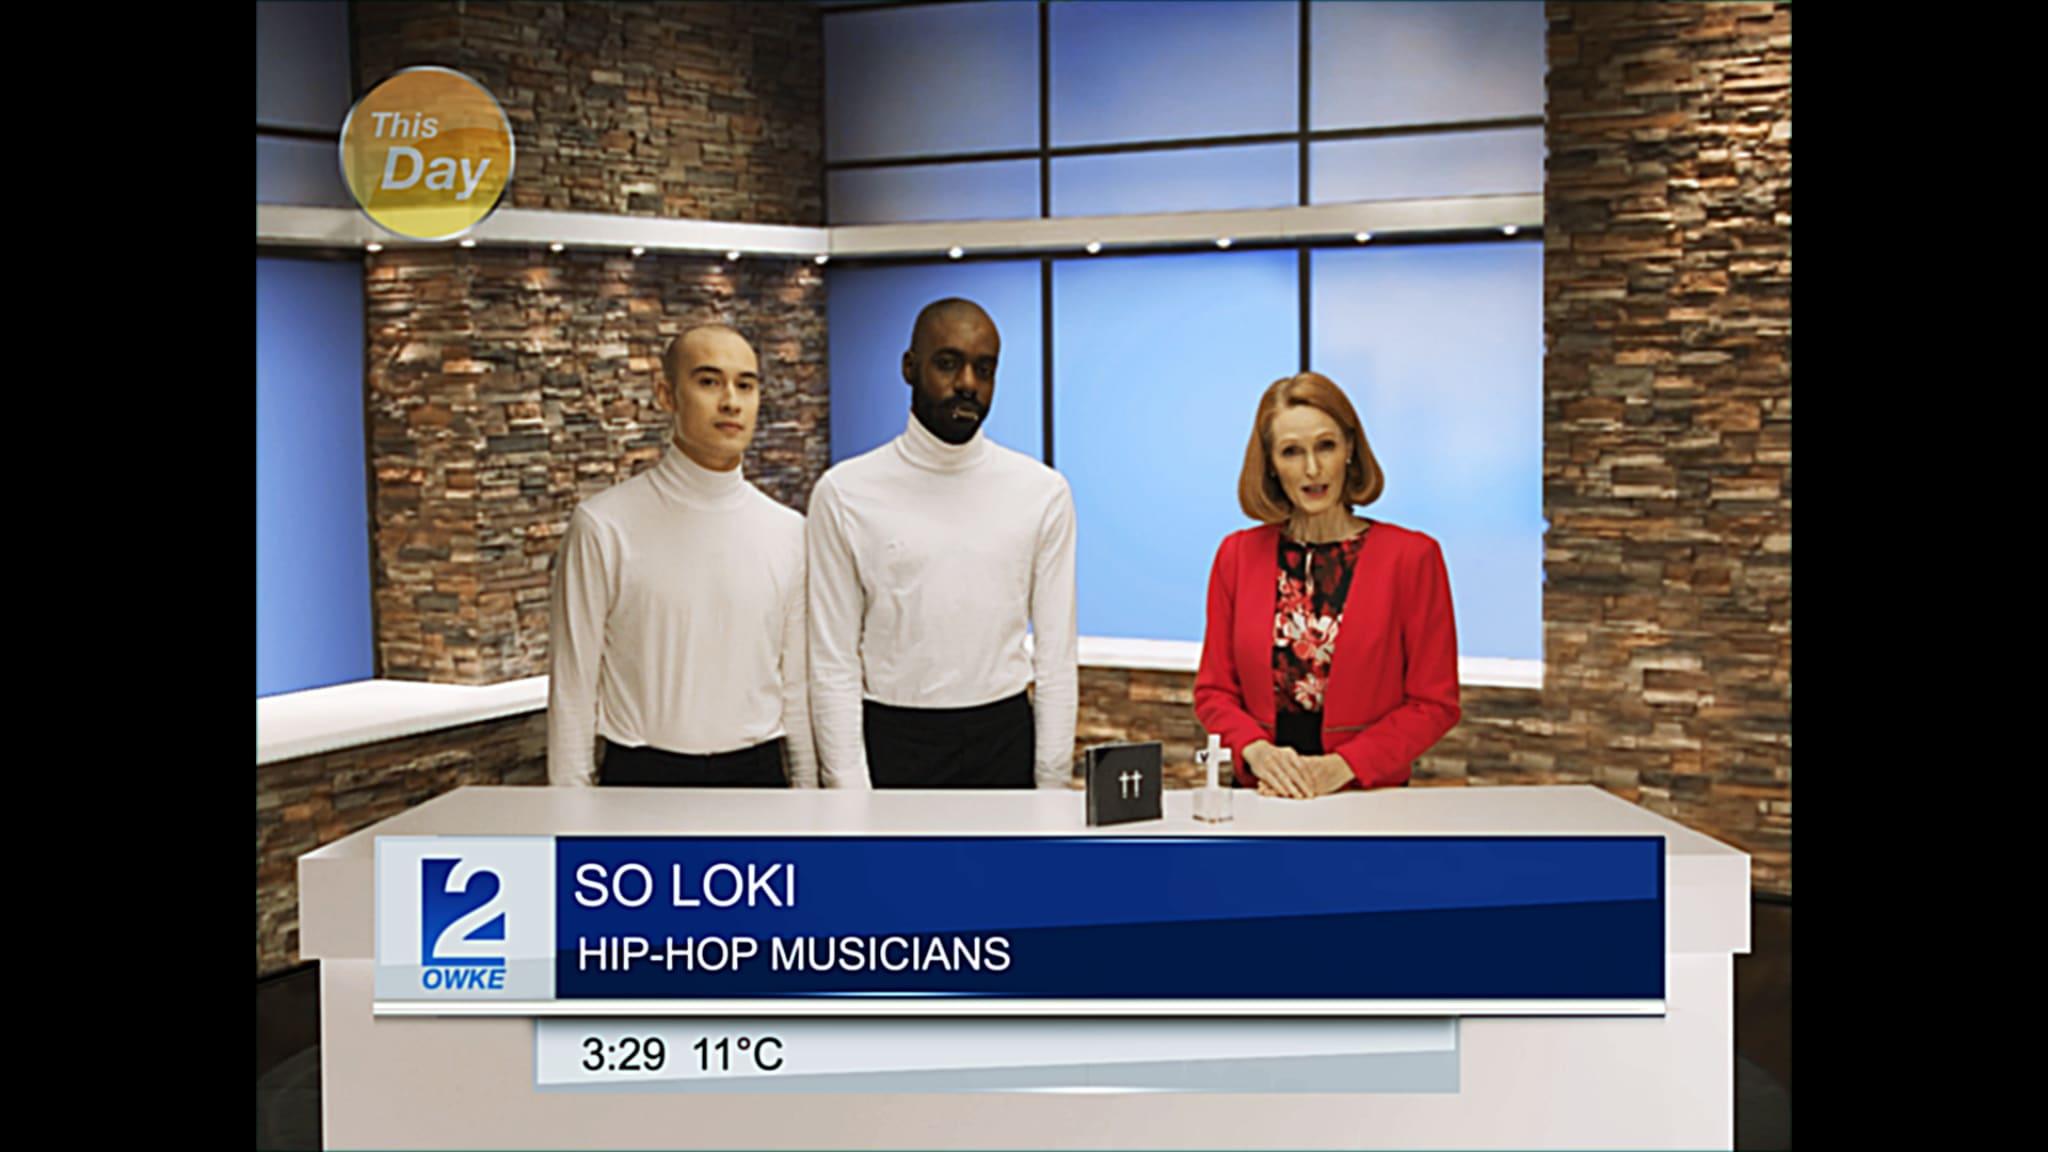 so-loki-athletes-world-music-video-1